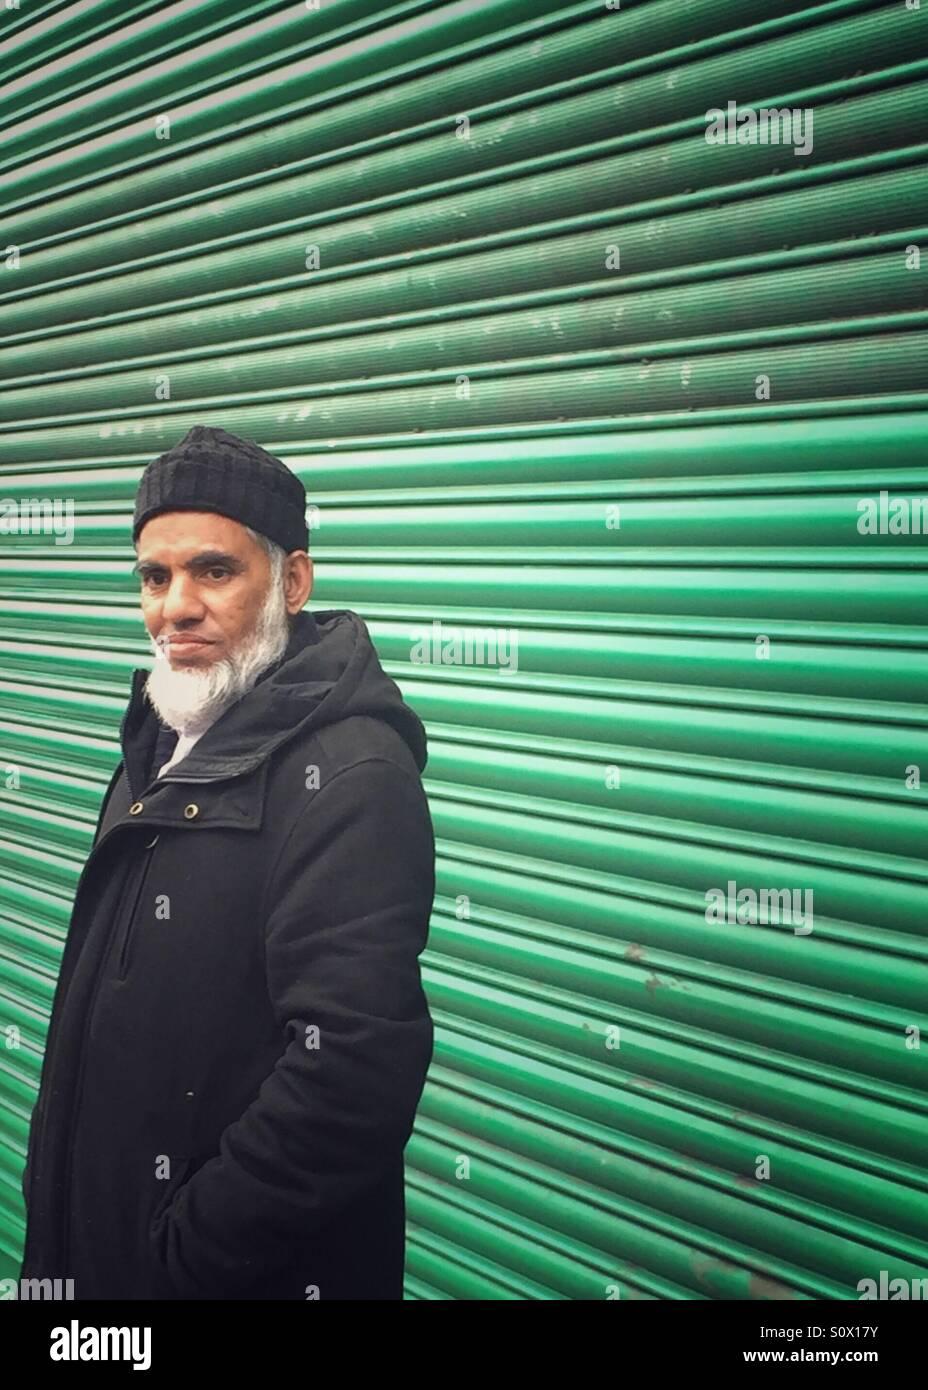 Portrait of a Bangladeshi man by green shutters in Whitechapel. London, U.K. - Stock Image